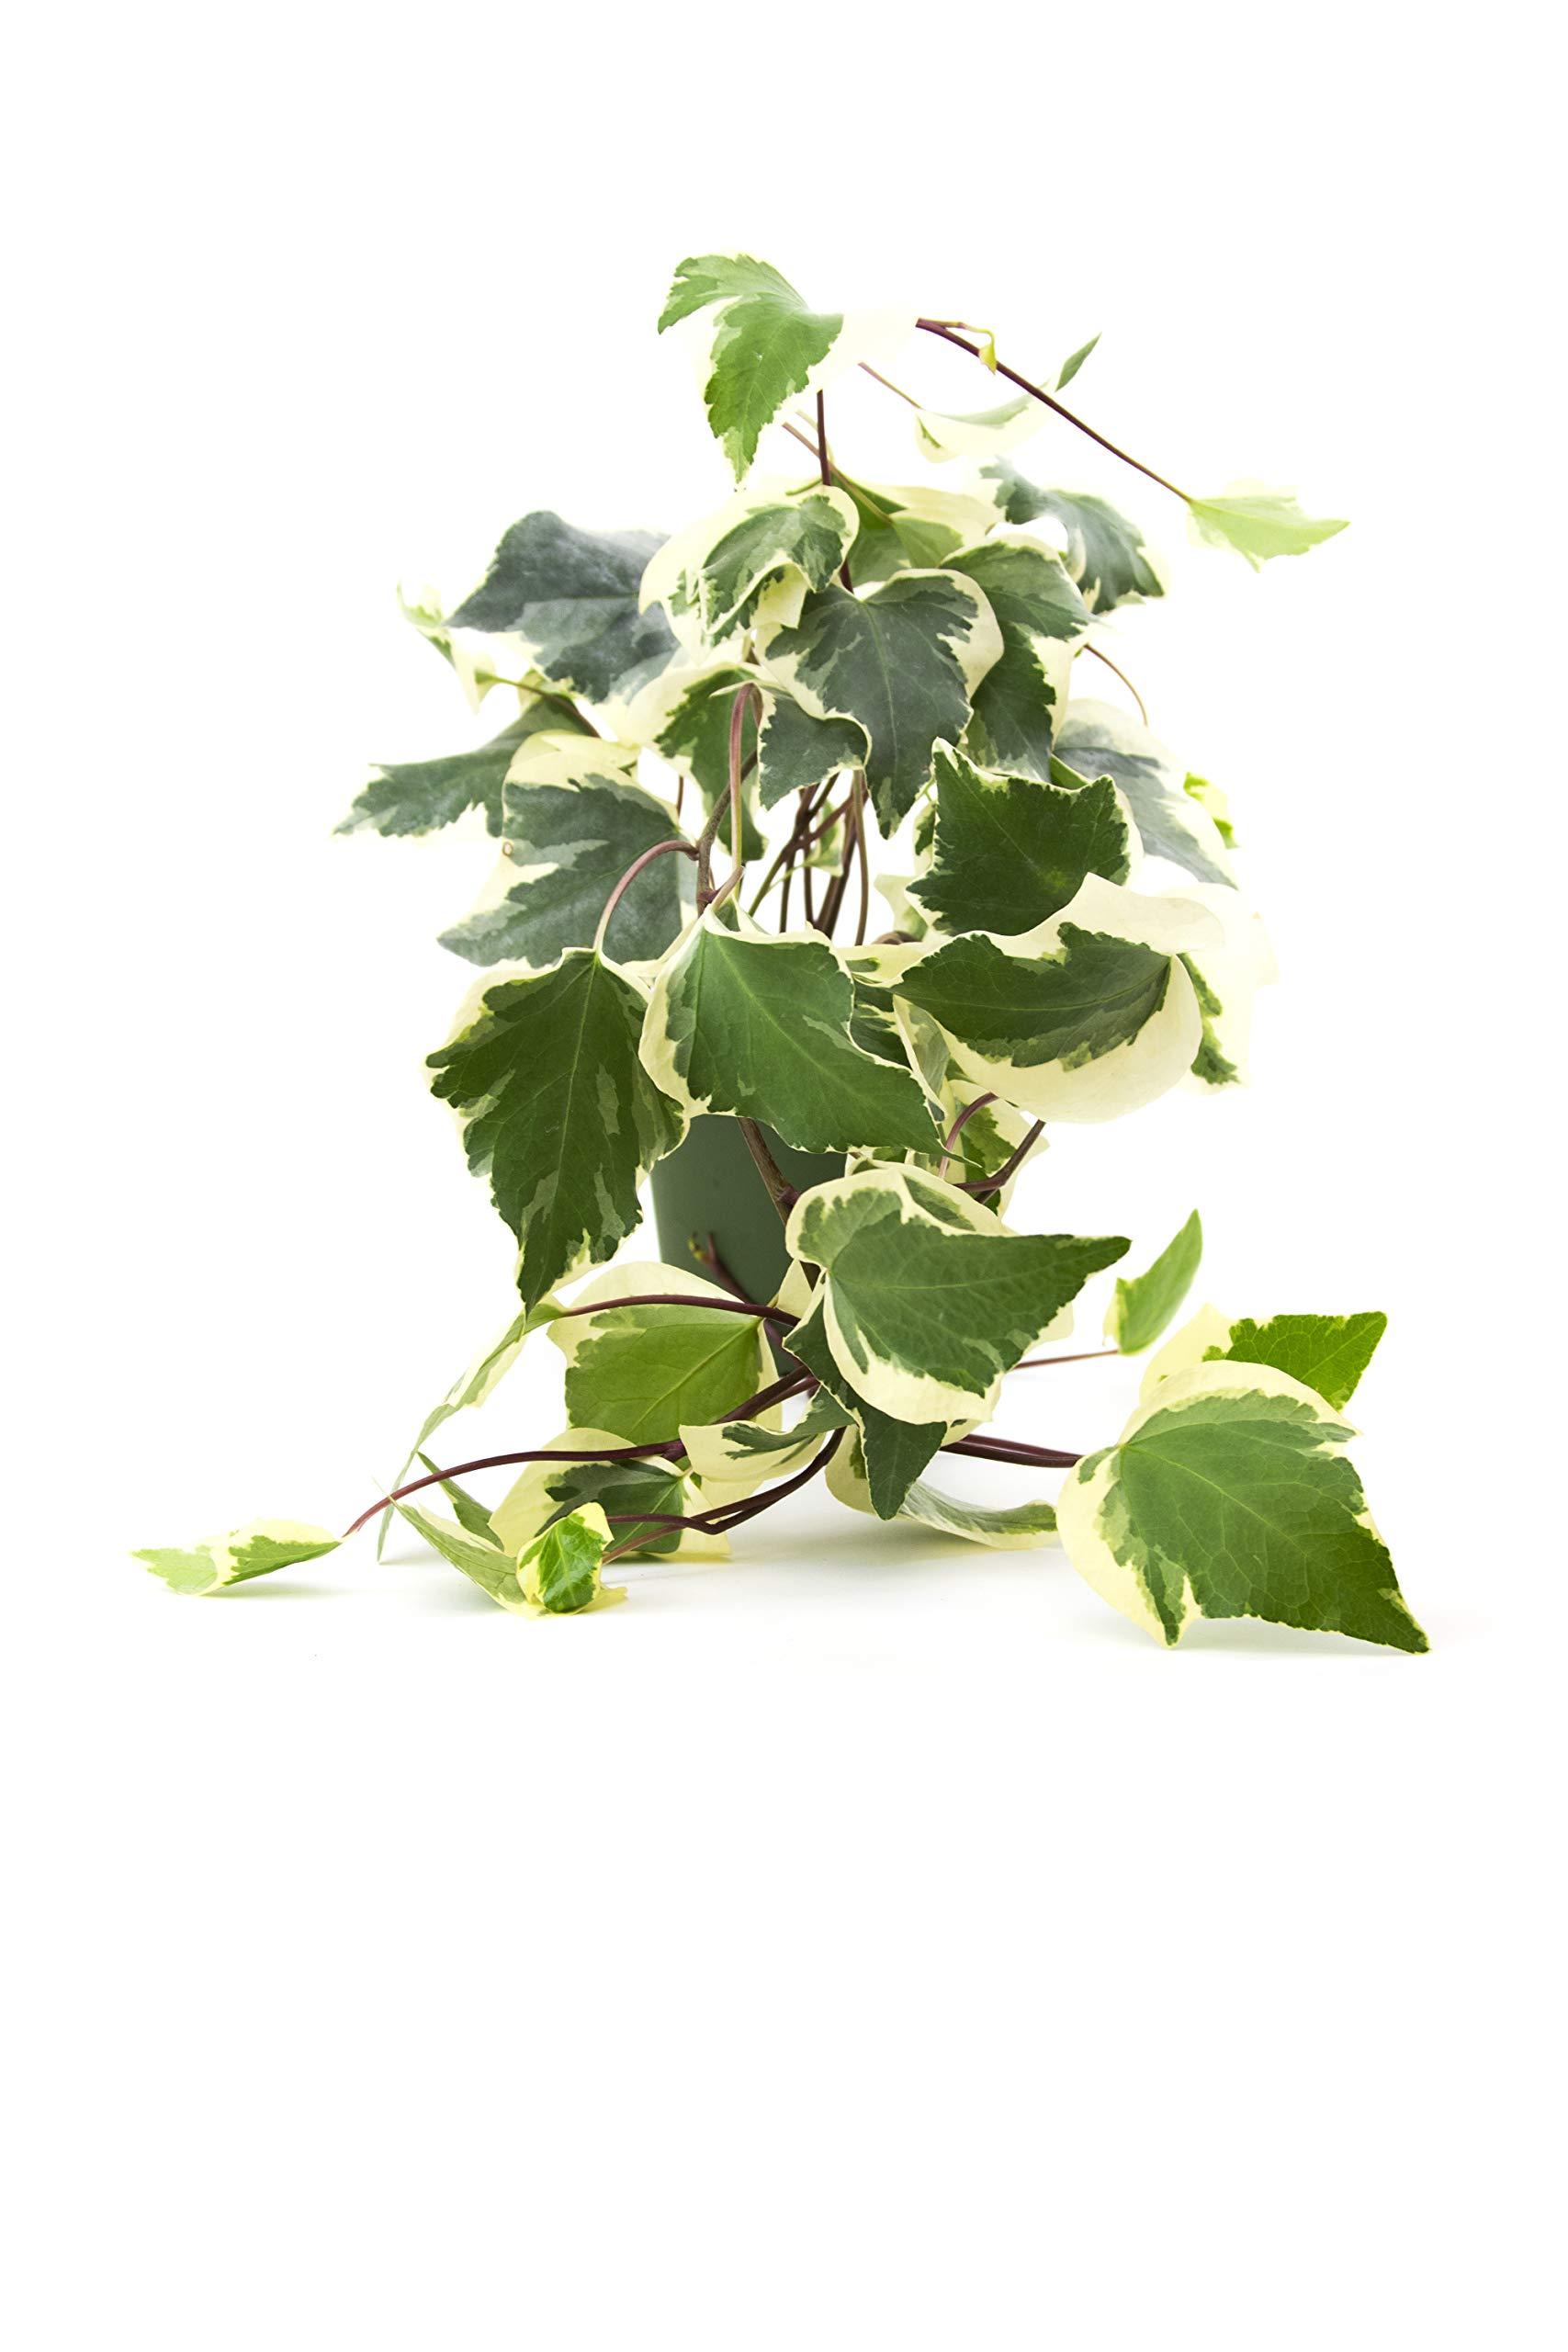 Burpee Hedera algeriensis, Gloire de Marengo Algerian Ivy in 4'' Pot